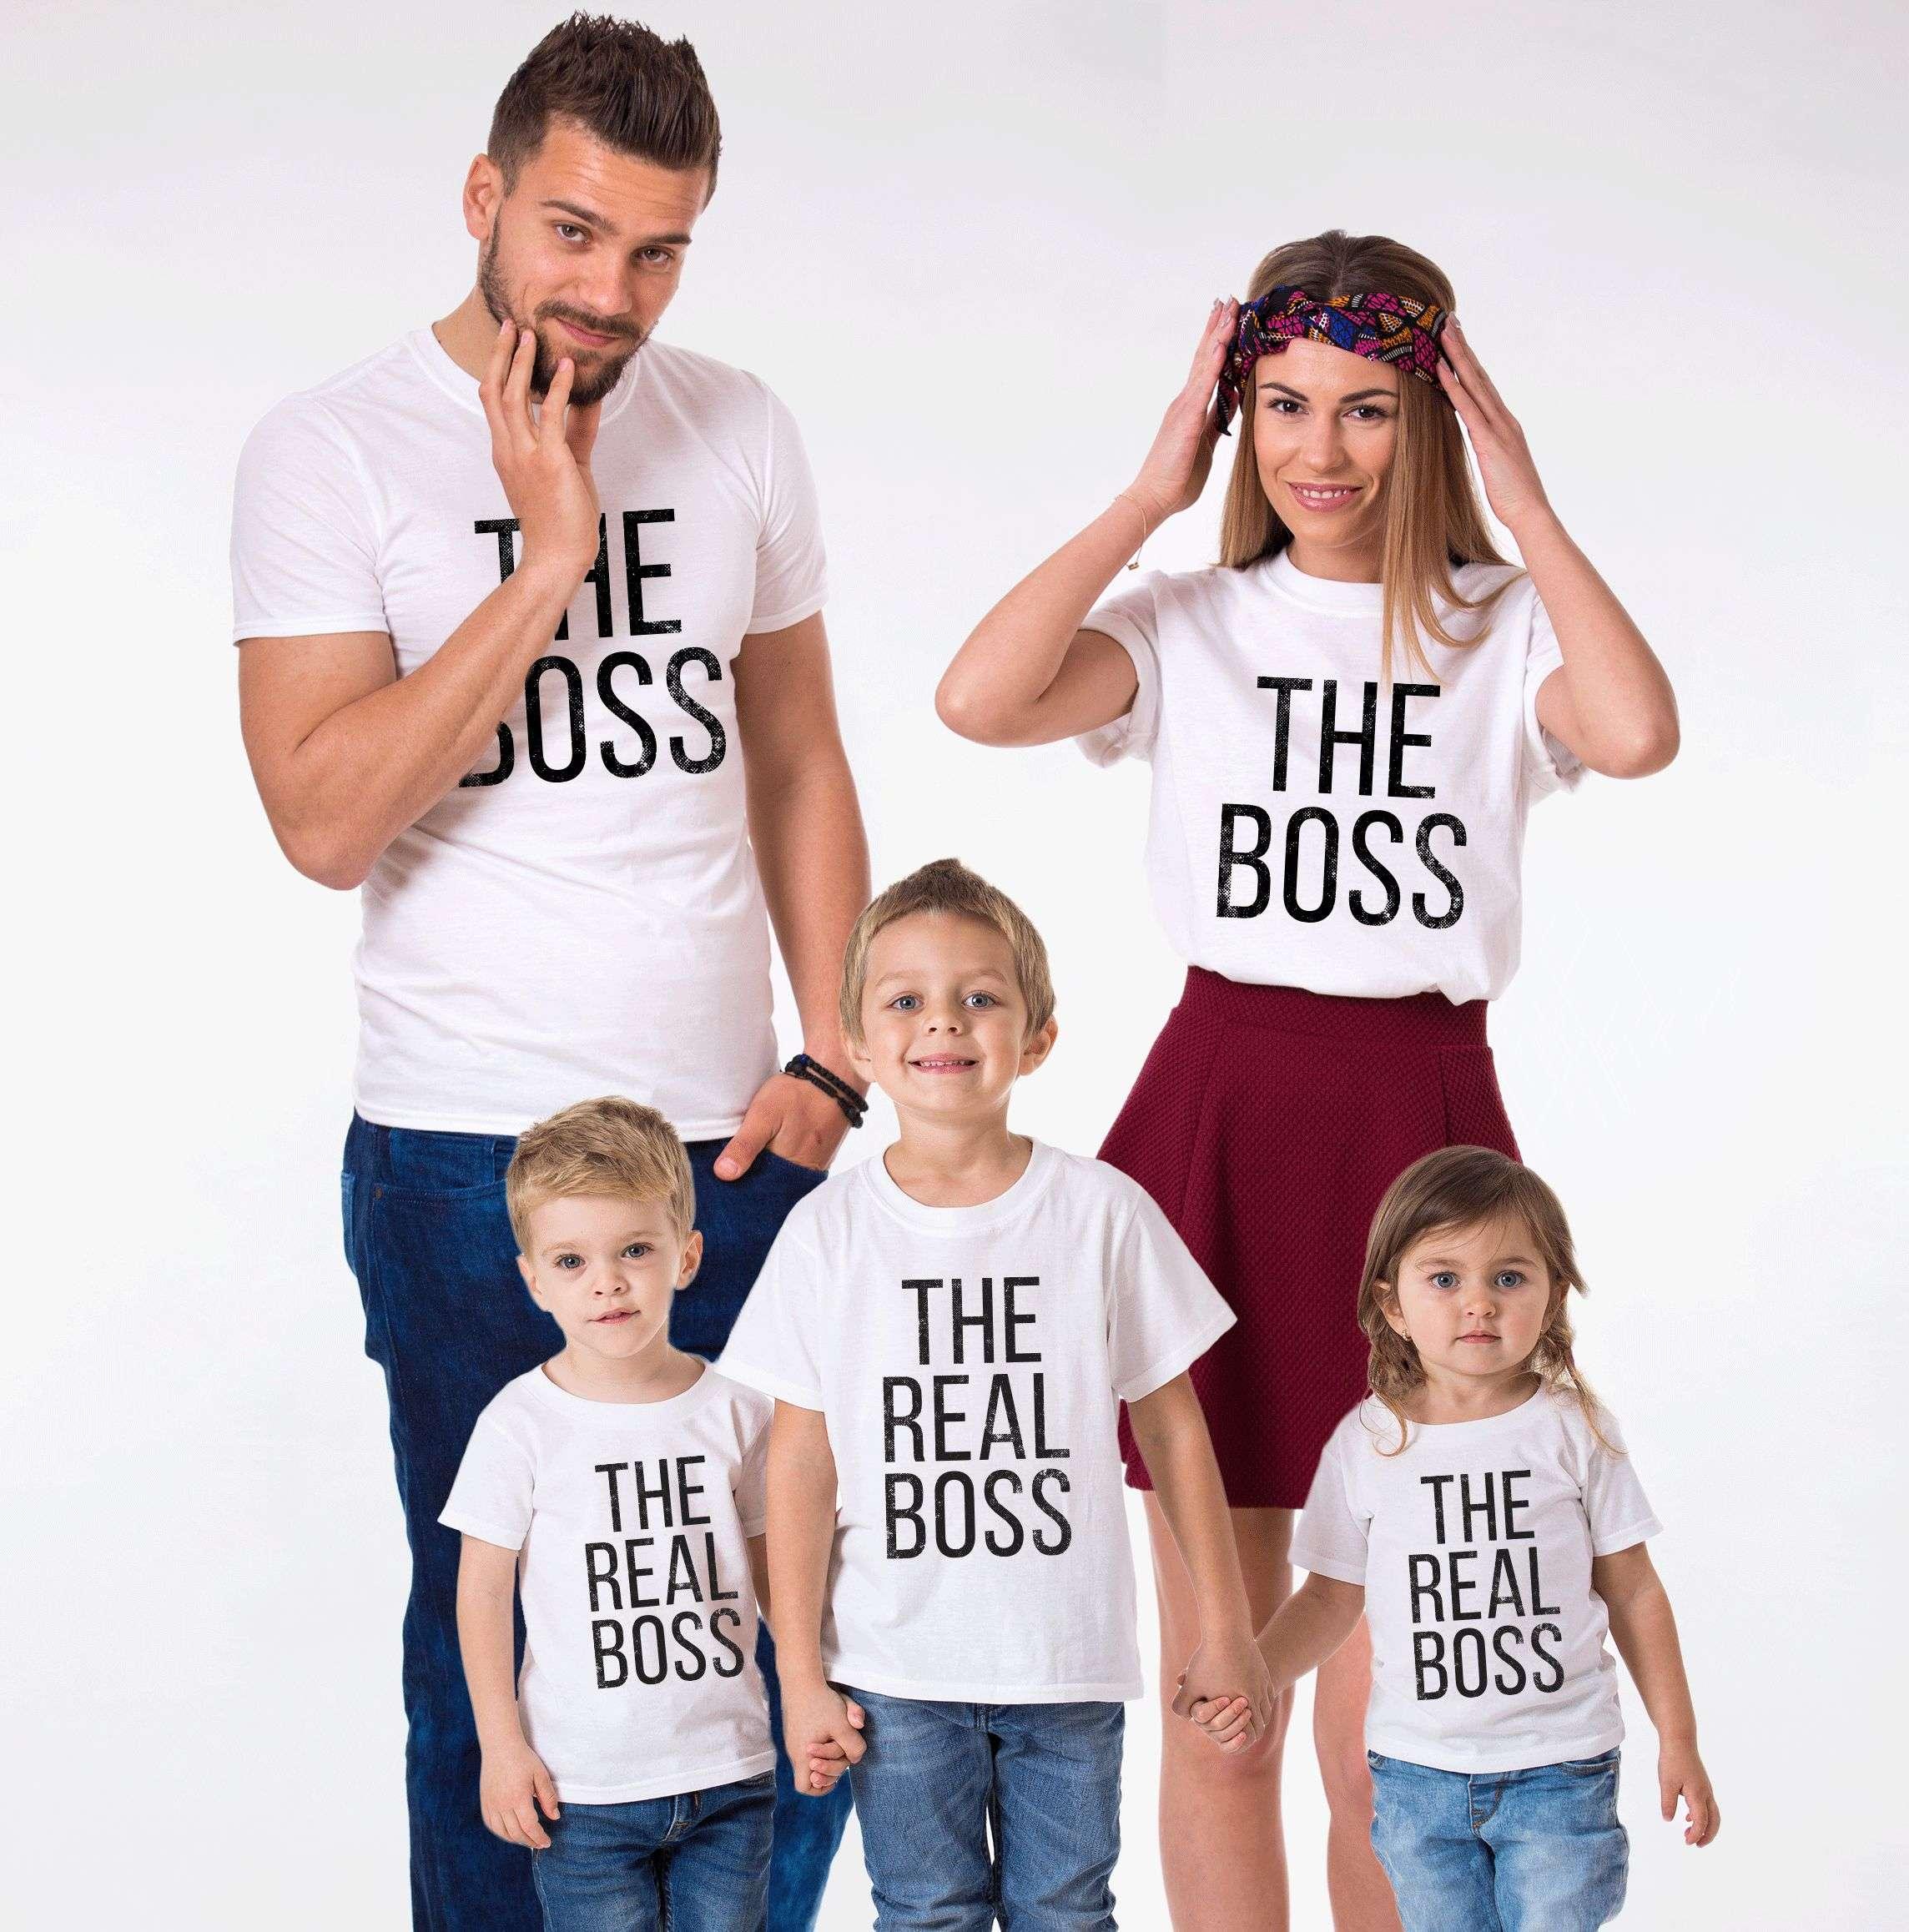 The Boss The Real Boss Shirts Matching Family Shirts